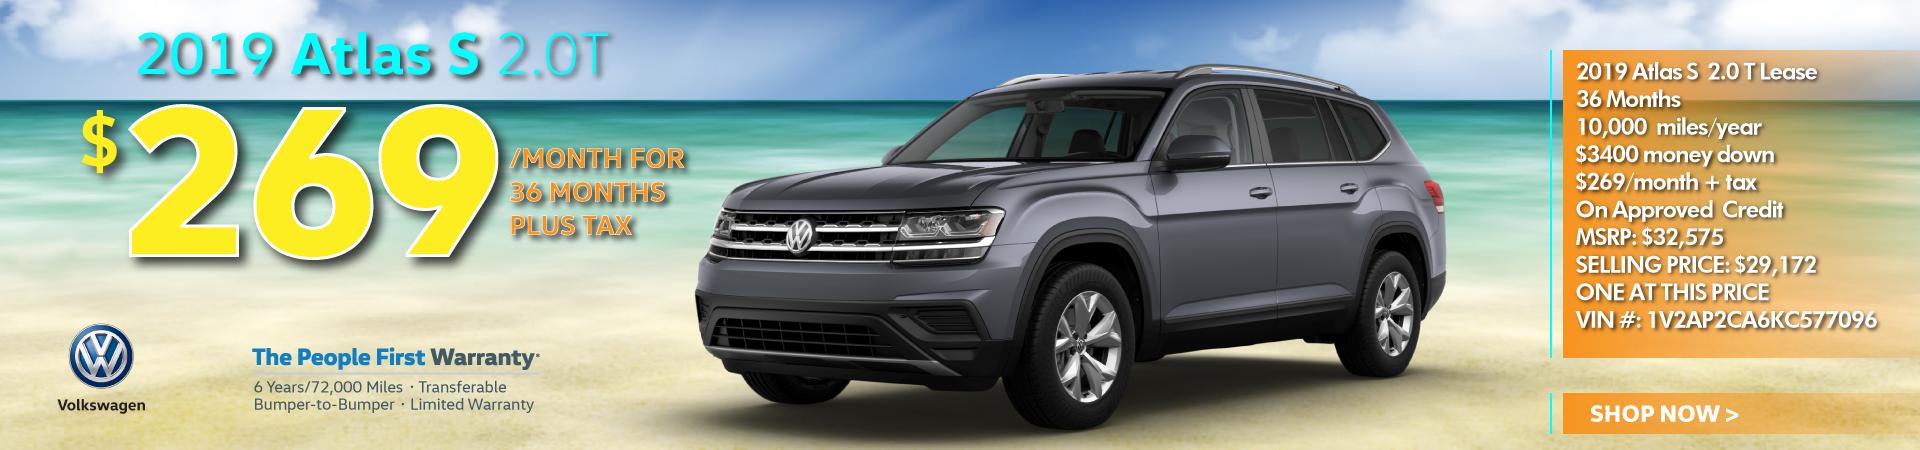 Vw Kearny Mesa >> Volkswagen Of Kearny Mesa Car Dealership Serving San Diego